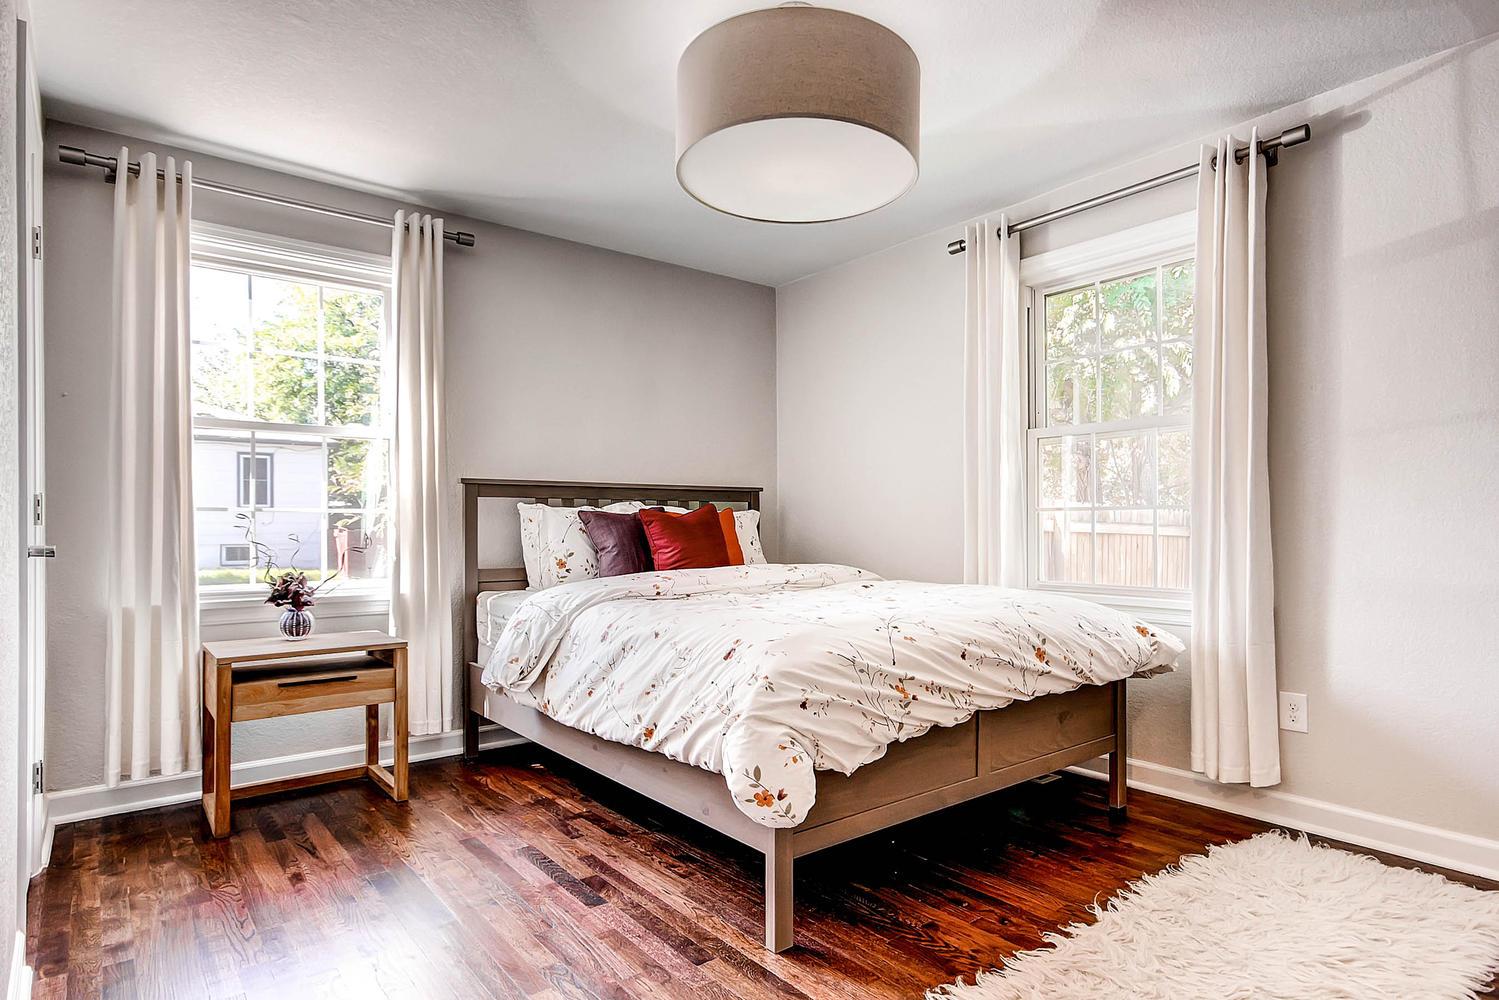 3297 S Lafayette St Englewood-large-020-Bedroom-1500x1000-72dpi.jpg